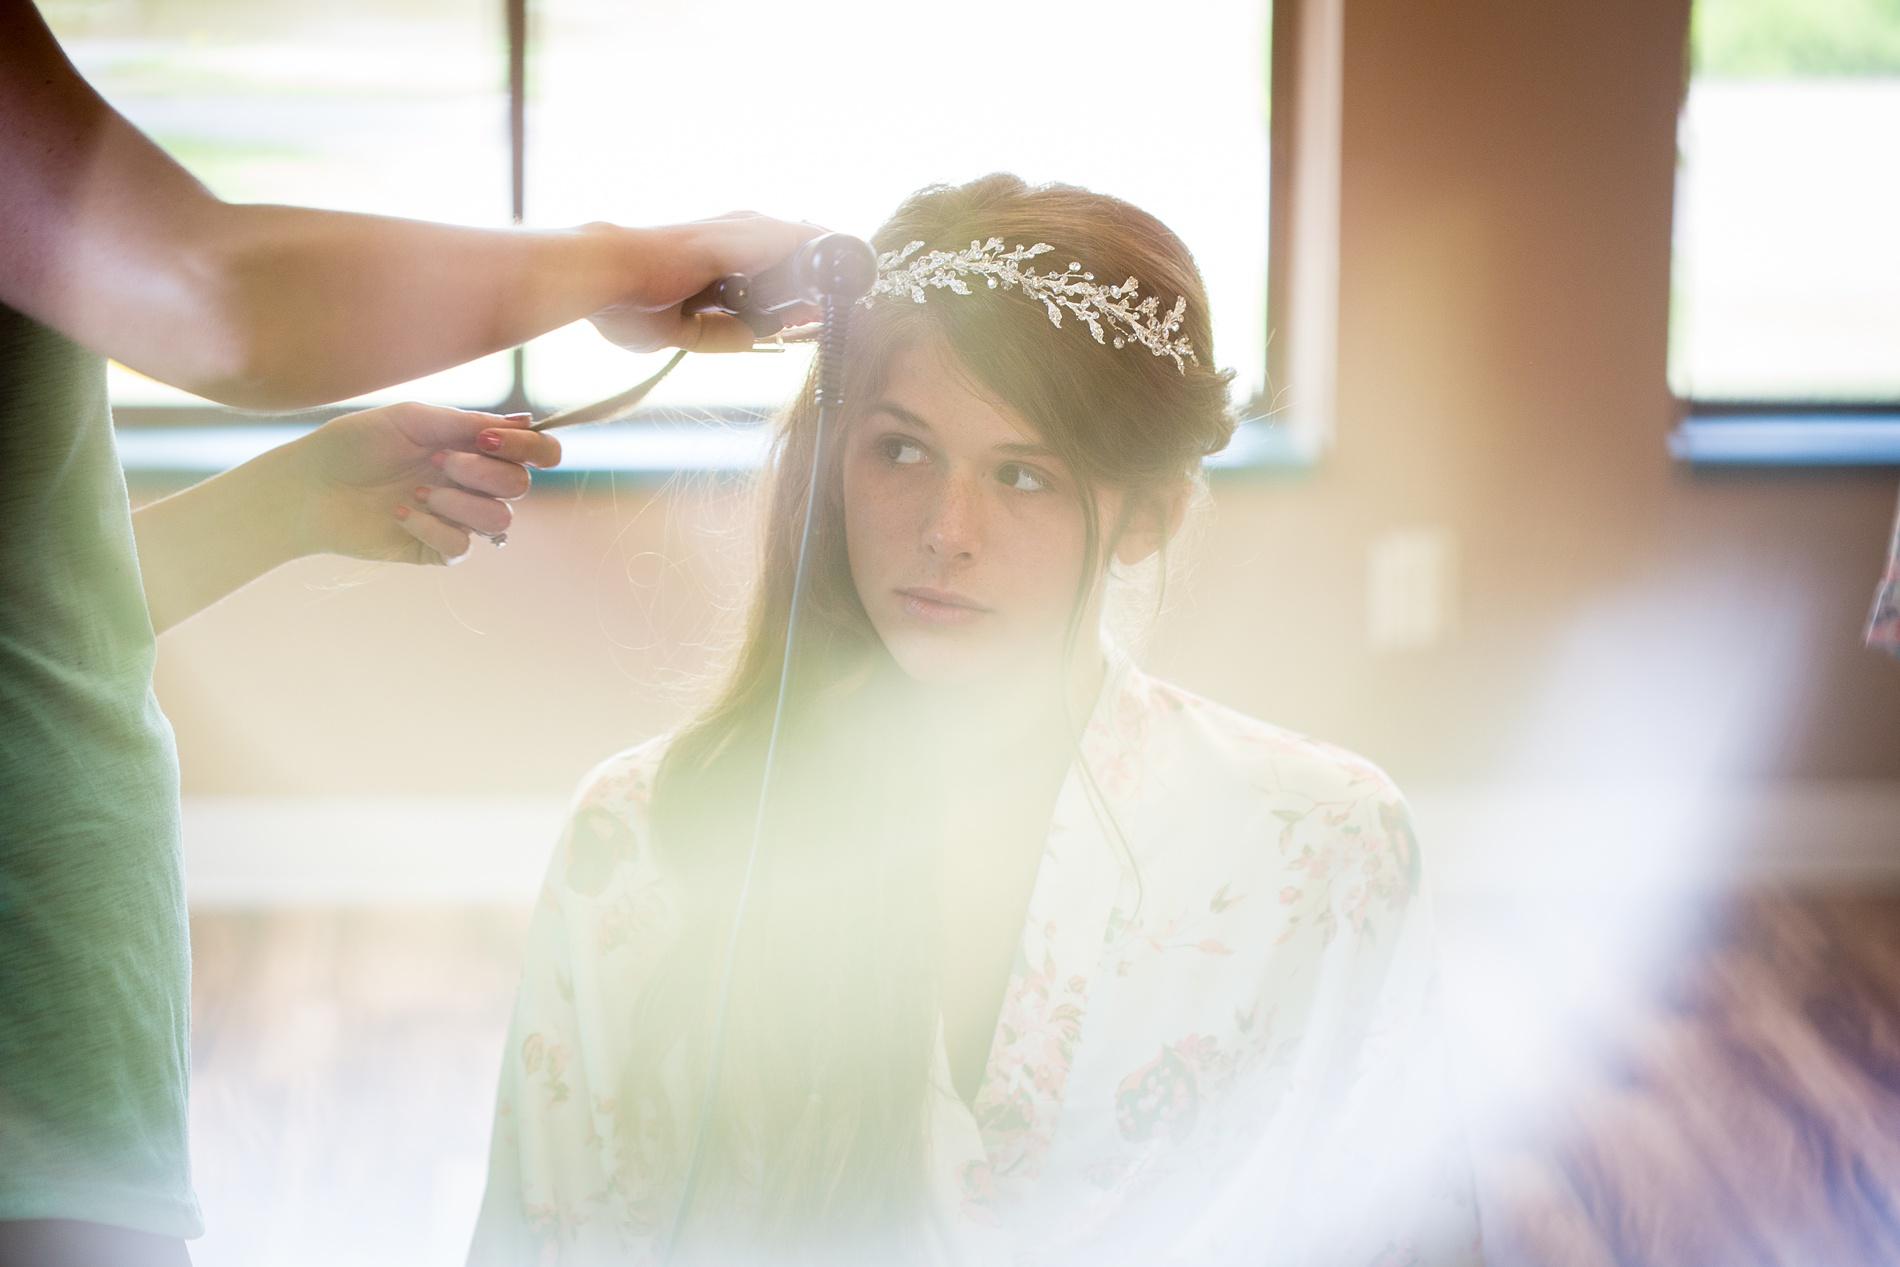 Brandon_Shafer_Photography_Brett_Autumn_Wedding_0015.jpg